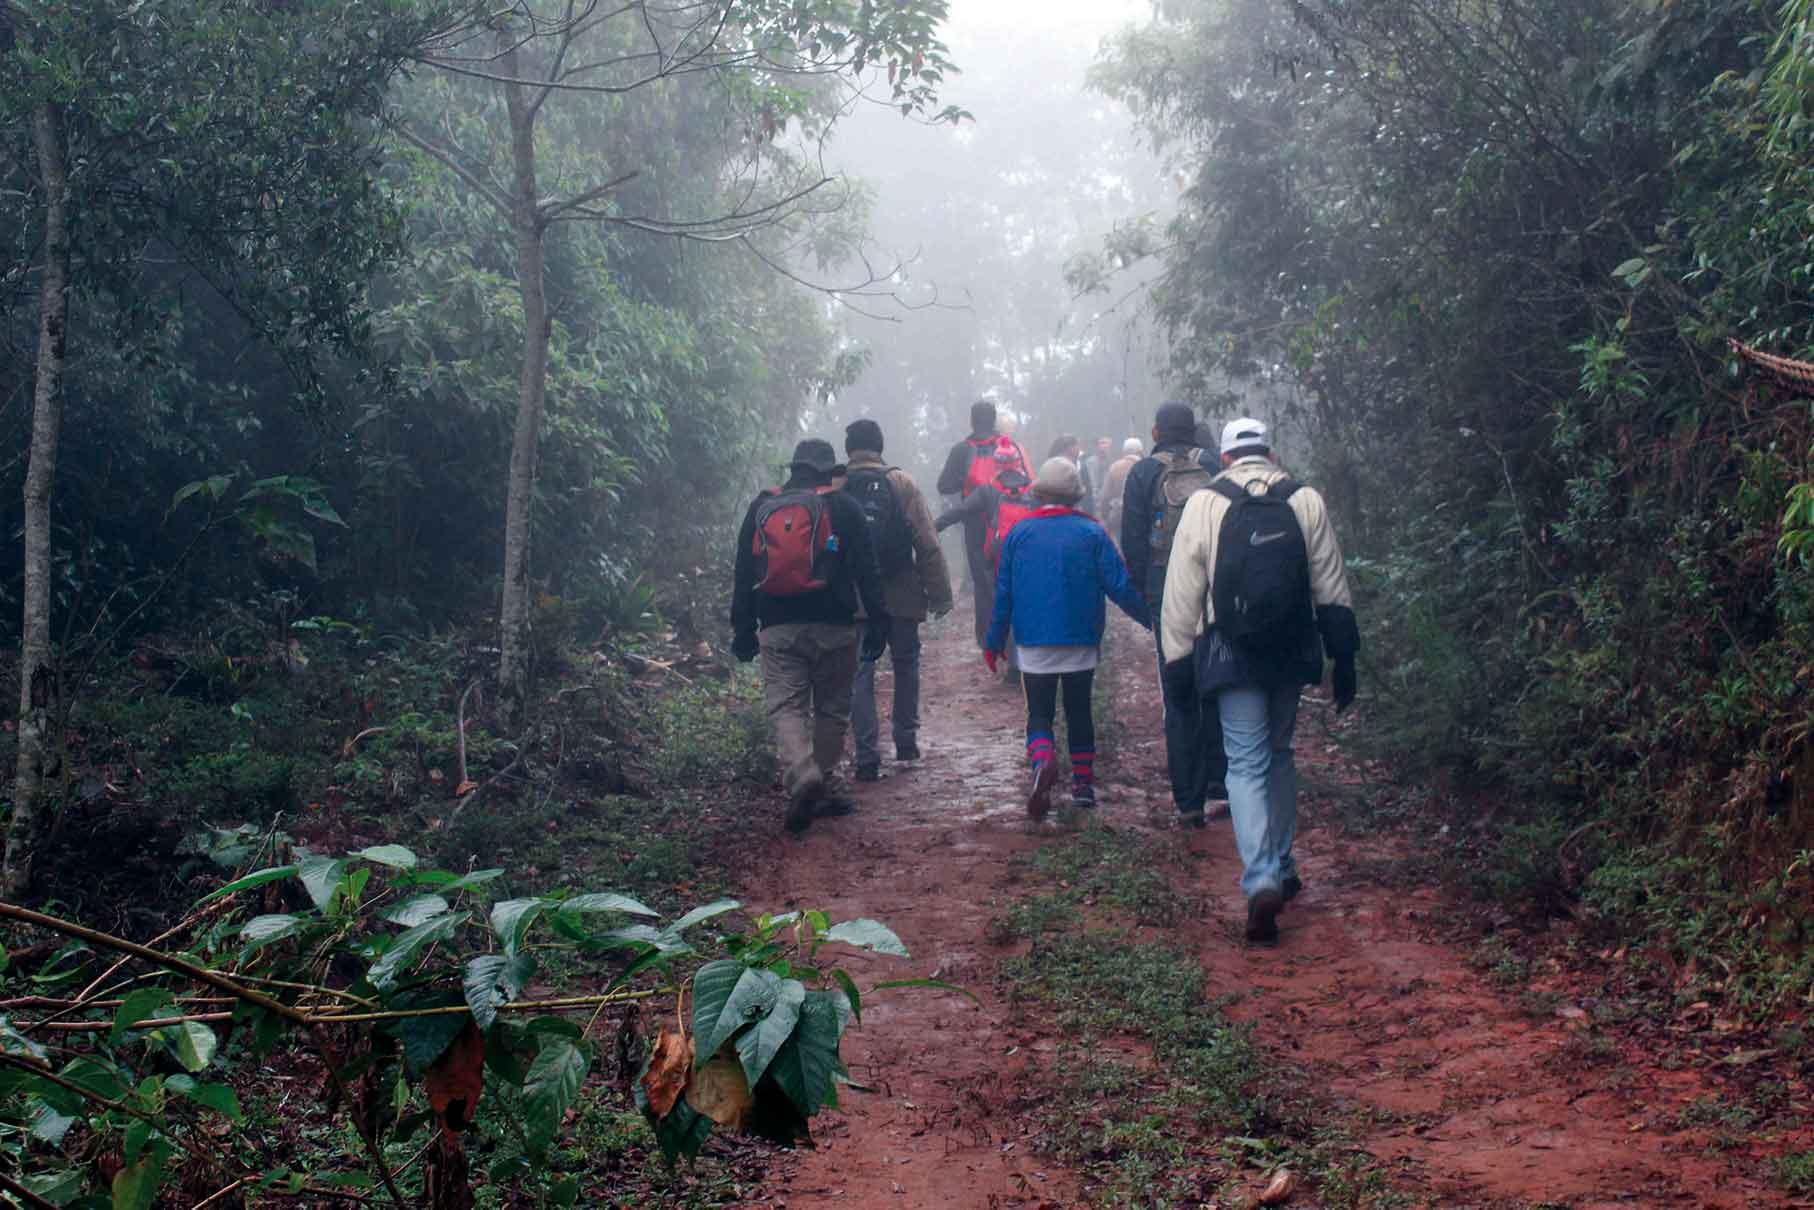 Piquete-Esporte-Trekking-Pico-dos-Marins-Troupe-da-Trilha-Monitores-Ambientais-bx